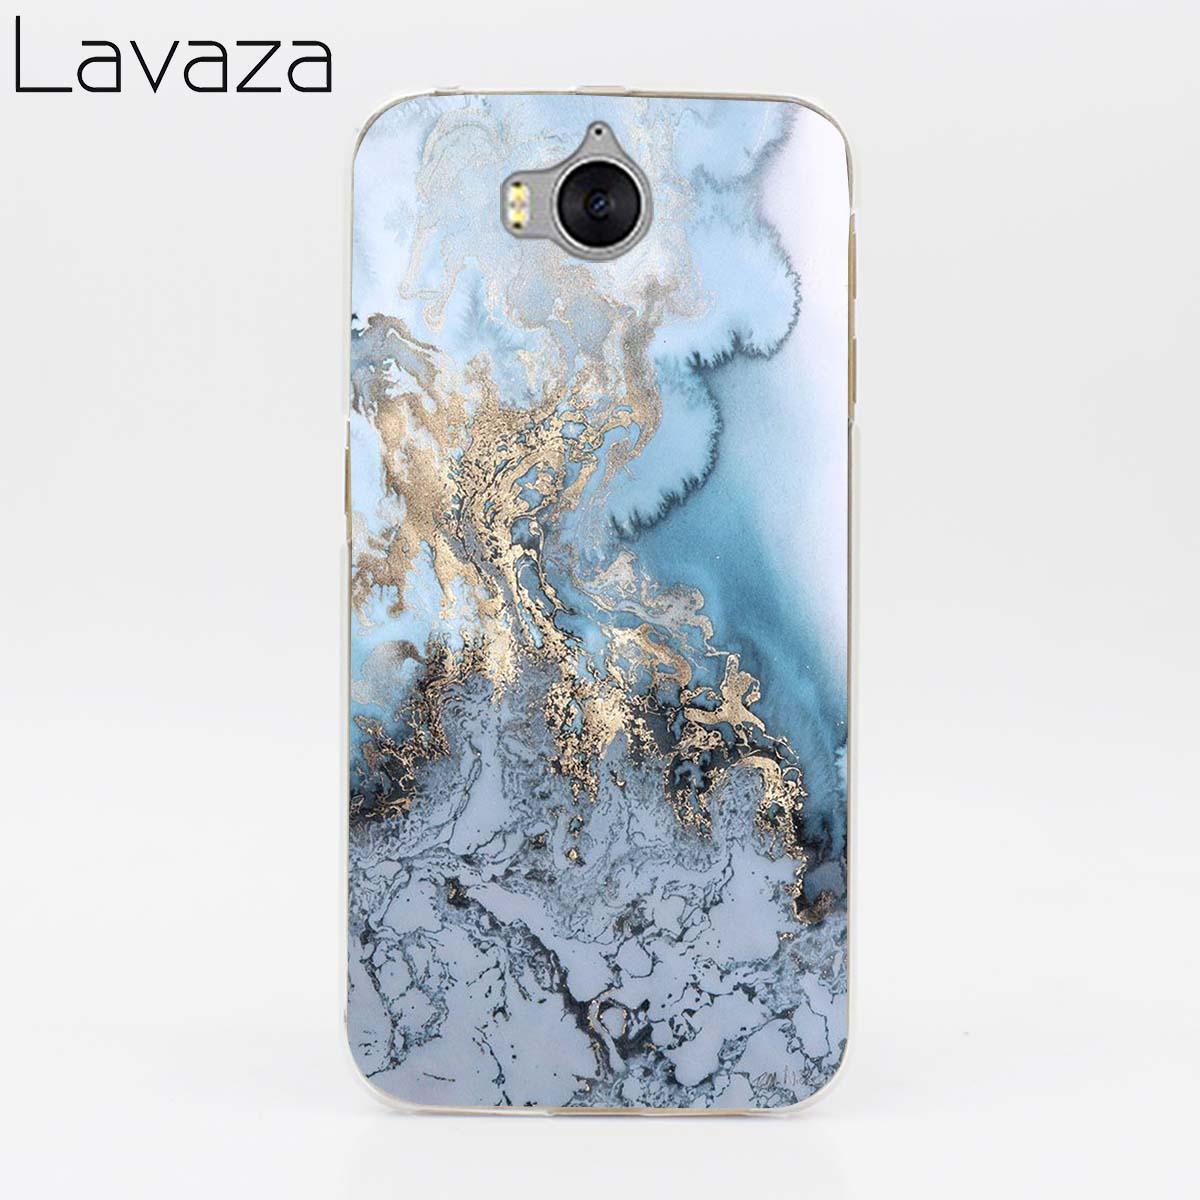 Lavaza Pretty Marble Mobile Case for Huawei Honor Y3 Y5 Y6 Y7 ii 6 6A 6C 6X 7 7A 7C 7X 8 9 10 Lite Pro 2018